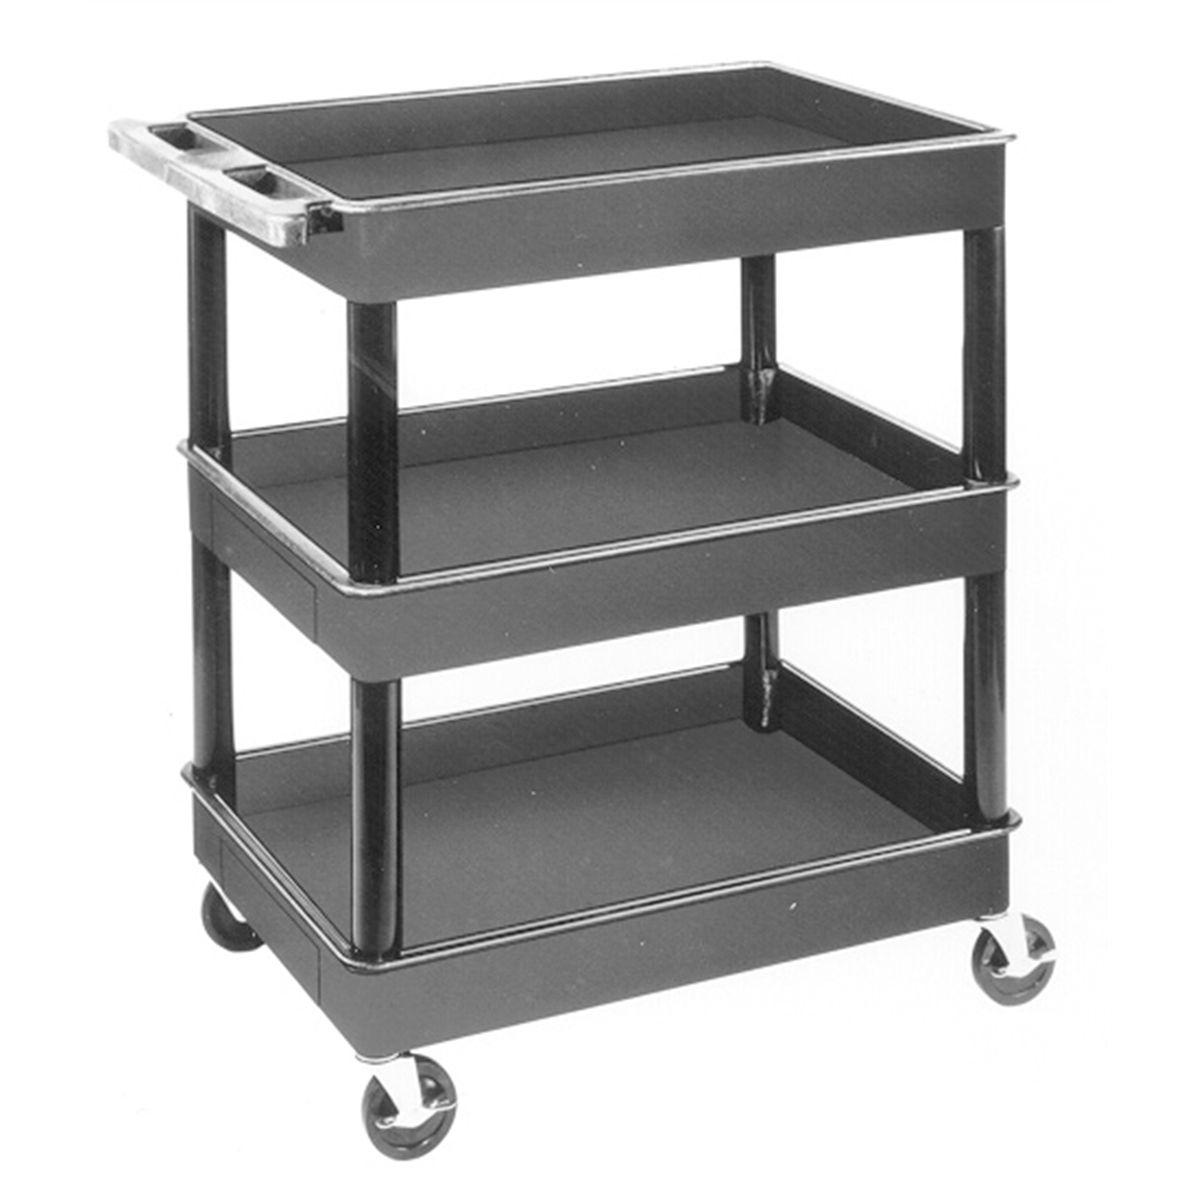 luxor tc111 3 shelf plastic service cart. Black Bedroom Furniture Sets. Home Design Ideas